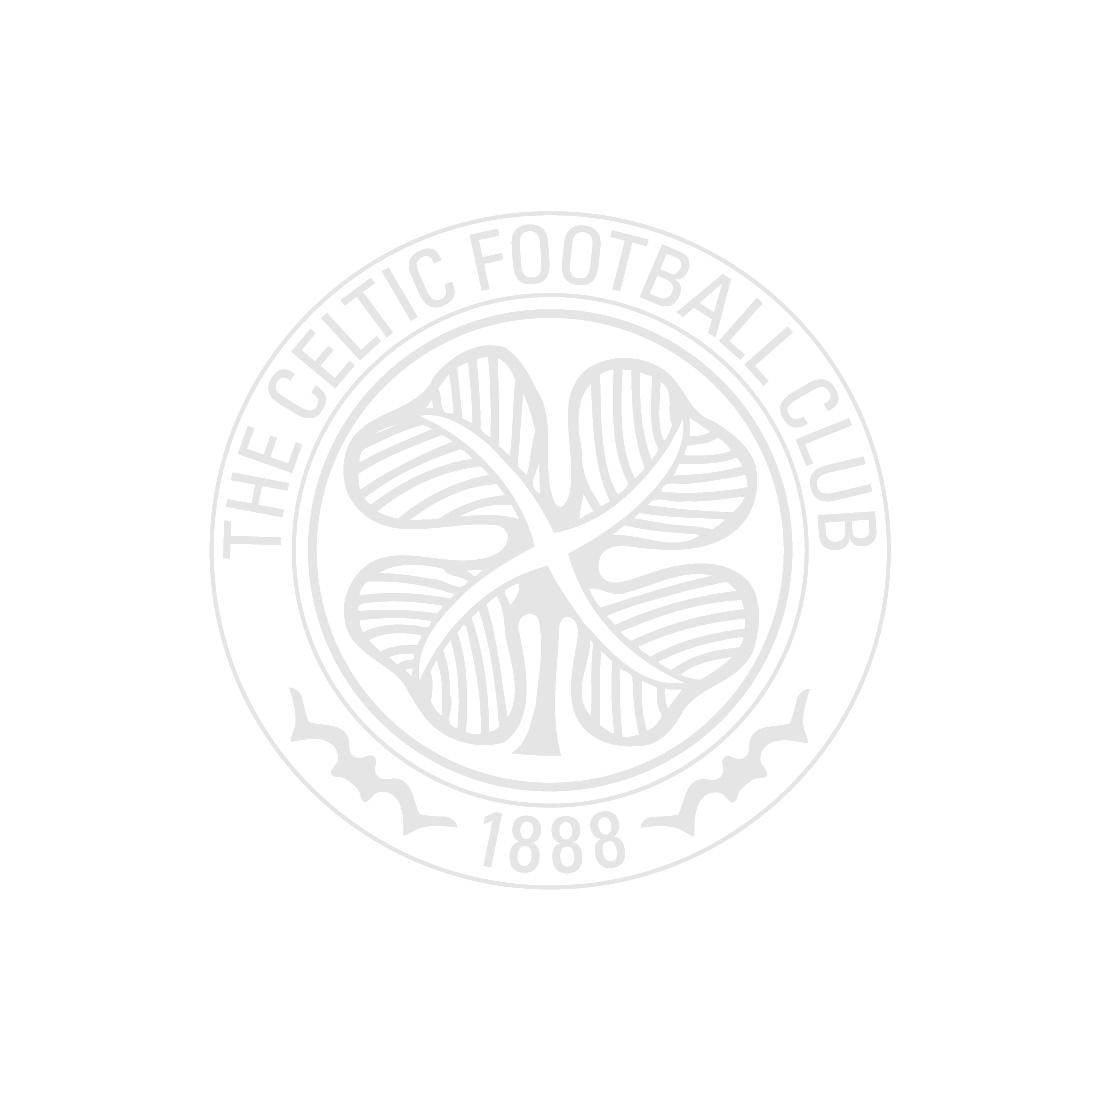 Celtic Away Hooped Bronx